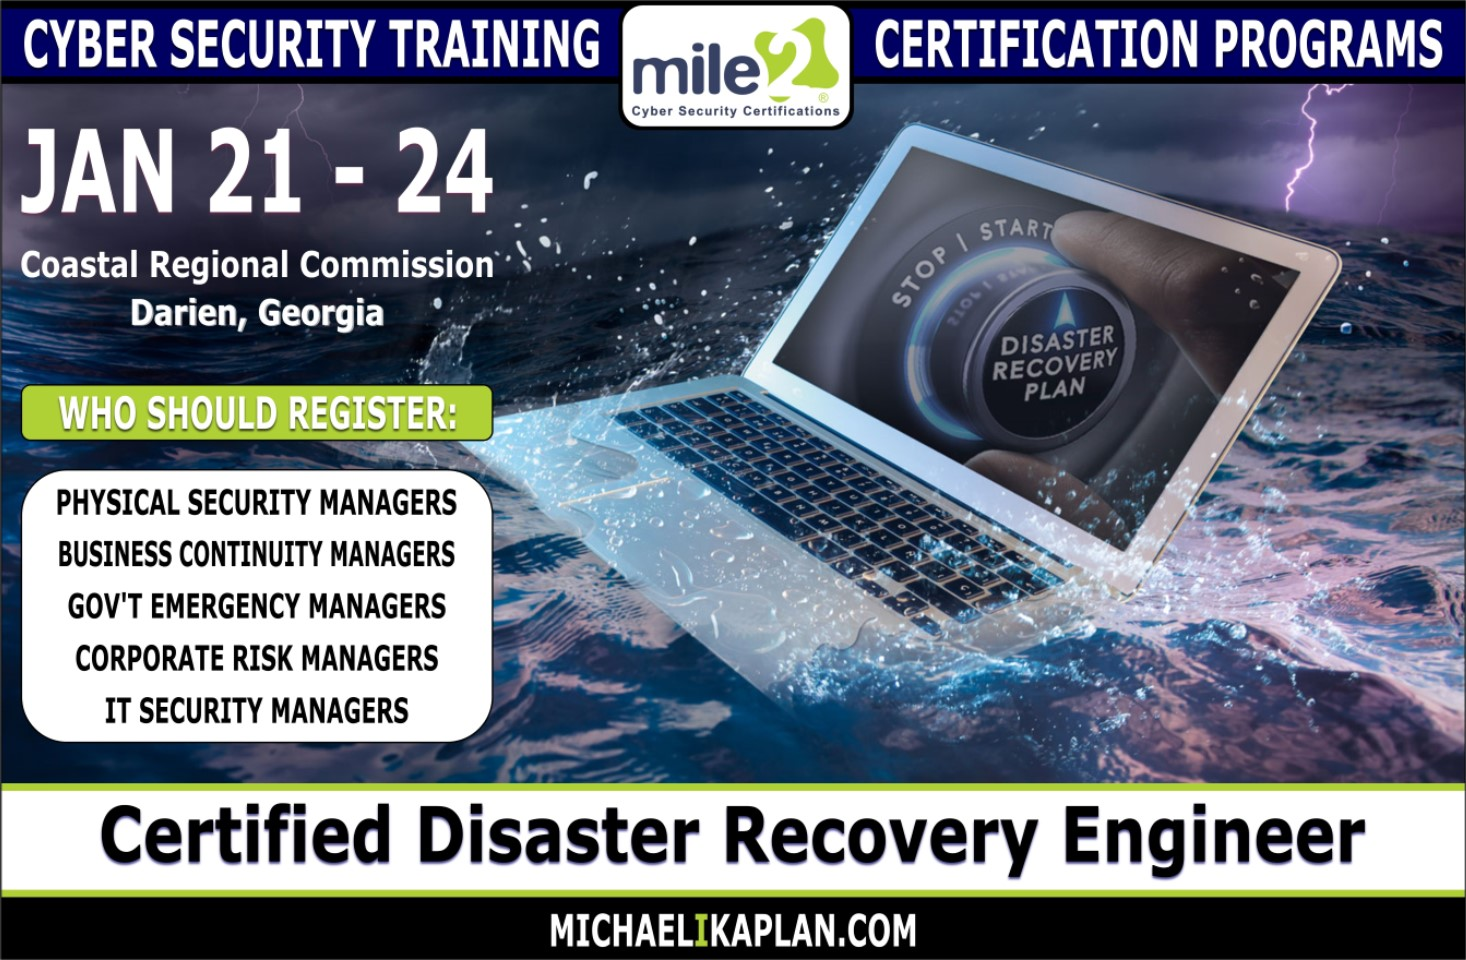 Michael I Kaplan Cyber Security Certification Courses In Darien